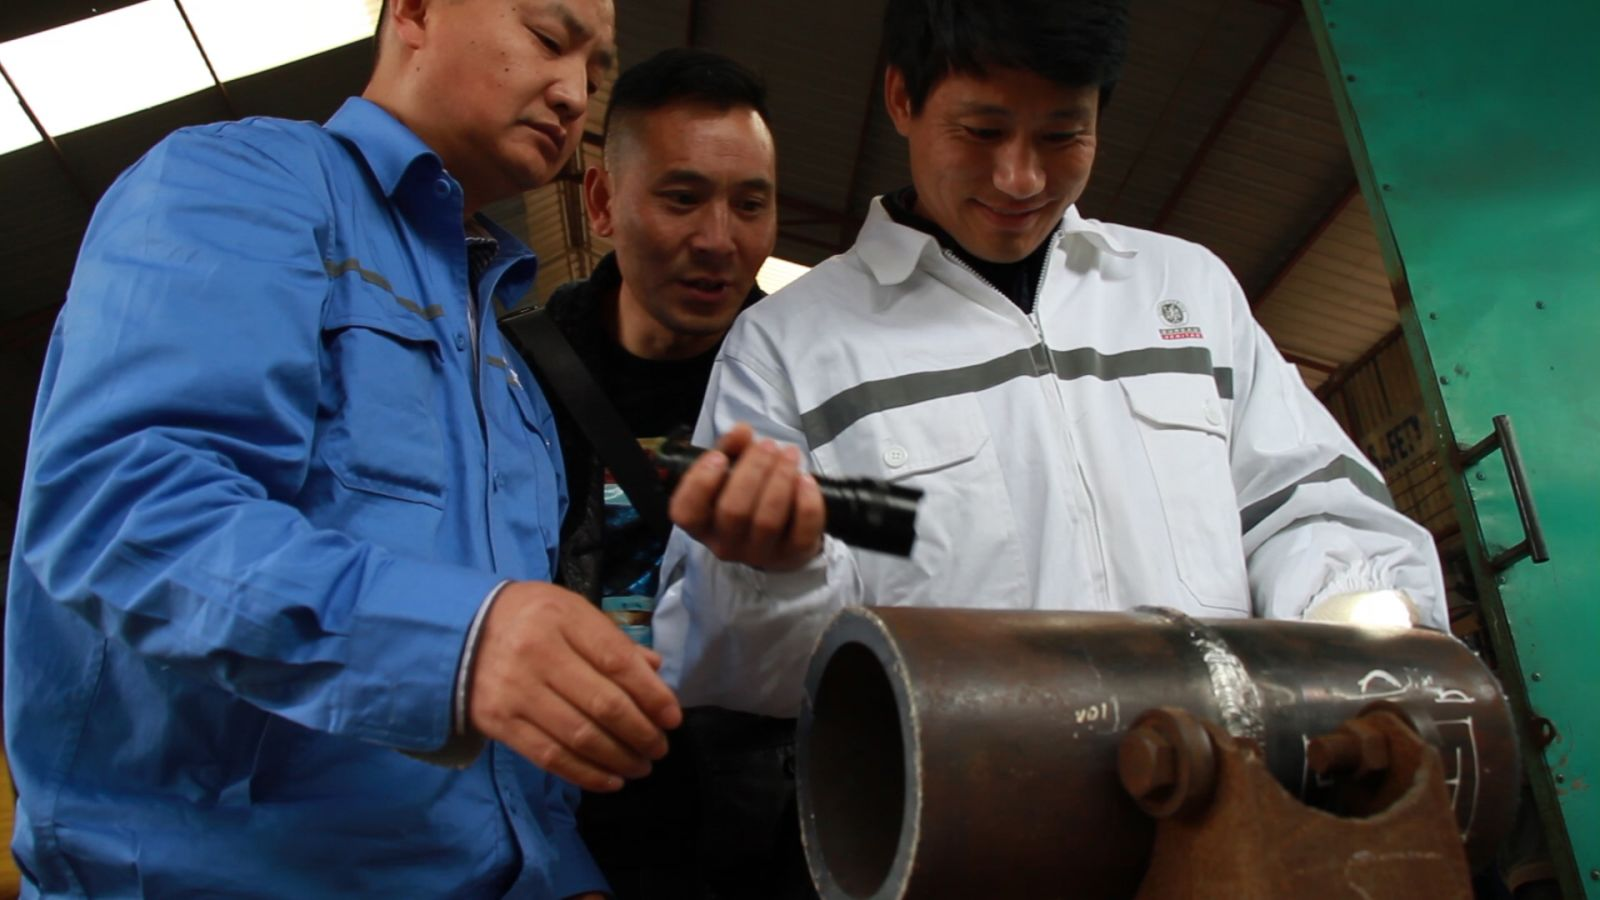 BUREAU VERITAS為越南焊工提供國際焊接證書,為中石化 -  KNPC Al-Zour項目工作